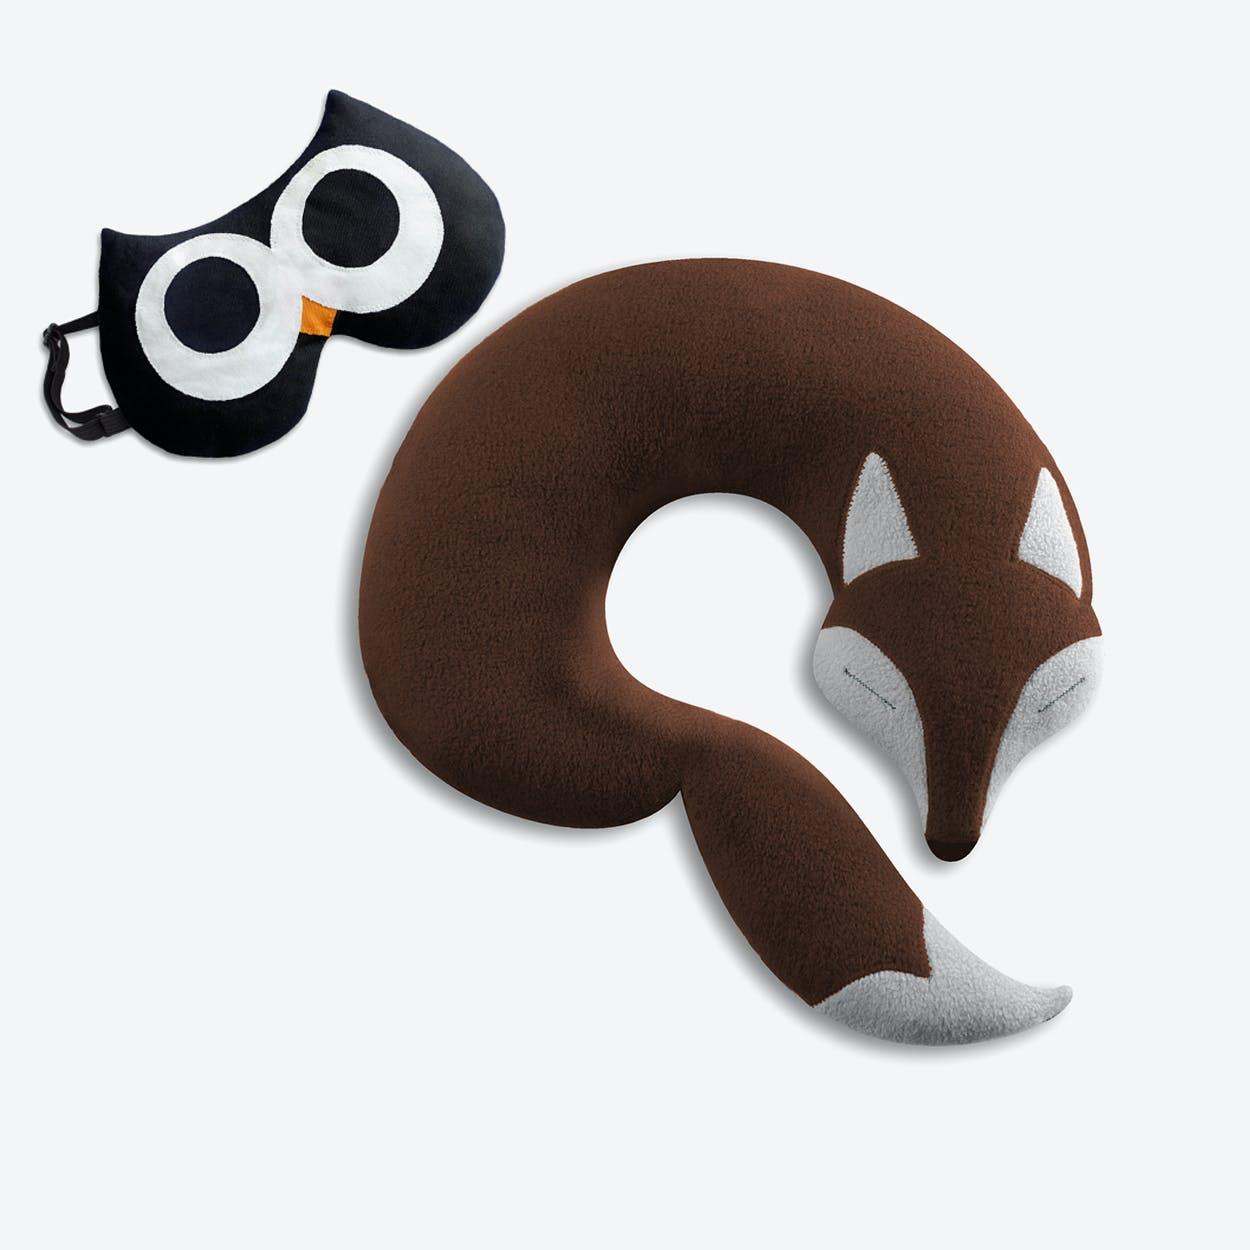 Travel Set of 2-Travel Pillow (Fox in Brown/Black) & Eye Mask (Owl in Black/Black)